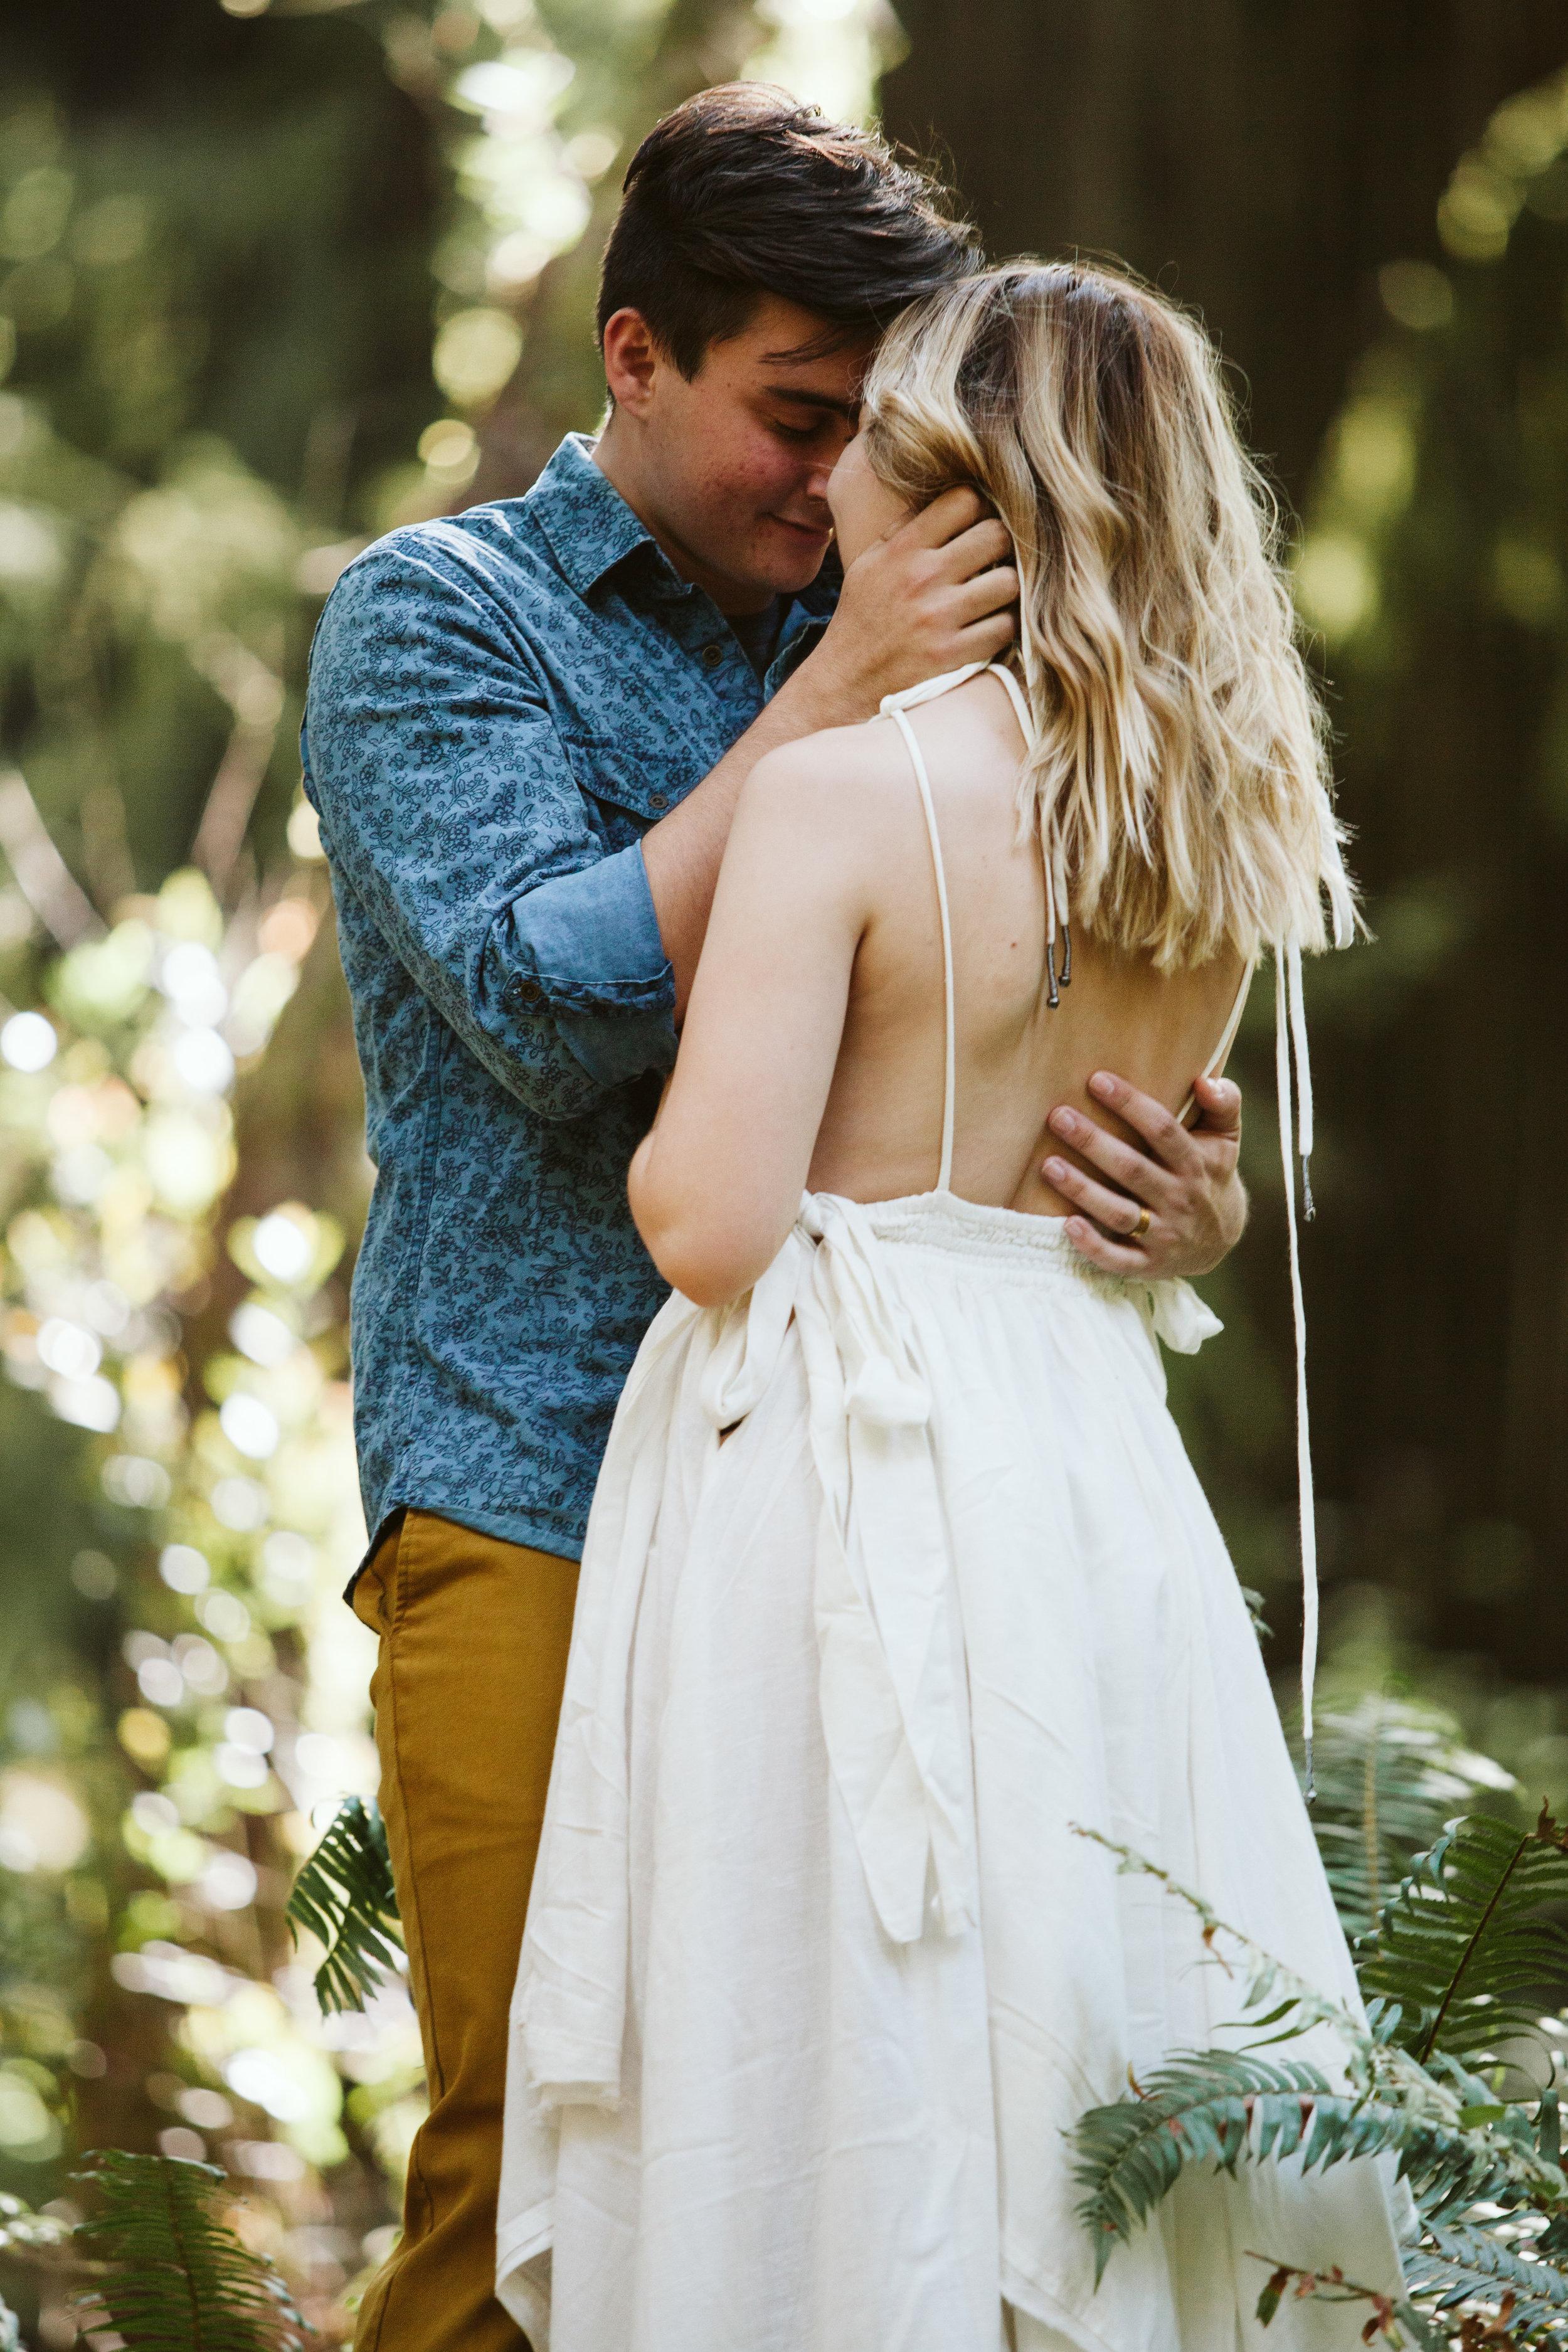 Hannah&Ben_Redwoods_Elopement_Engagement_PNW_SouthernOregon_NorthernCalifornia_ (6 of 23).jpg